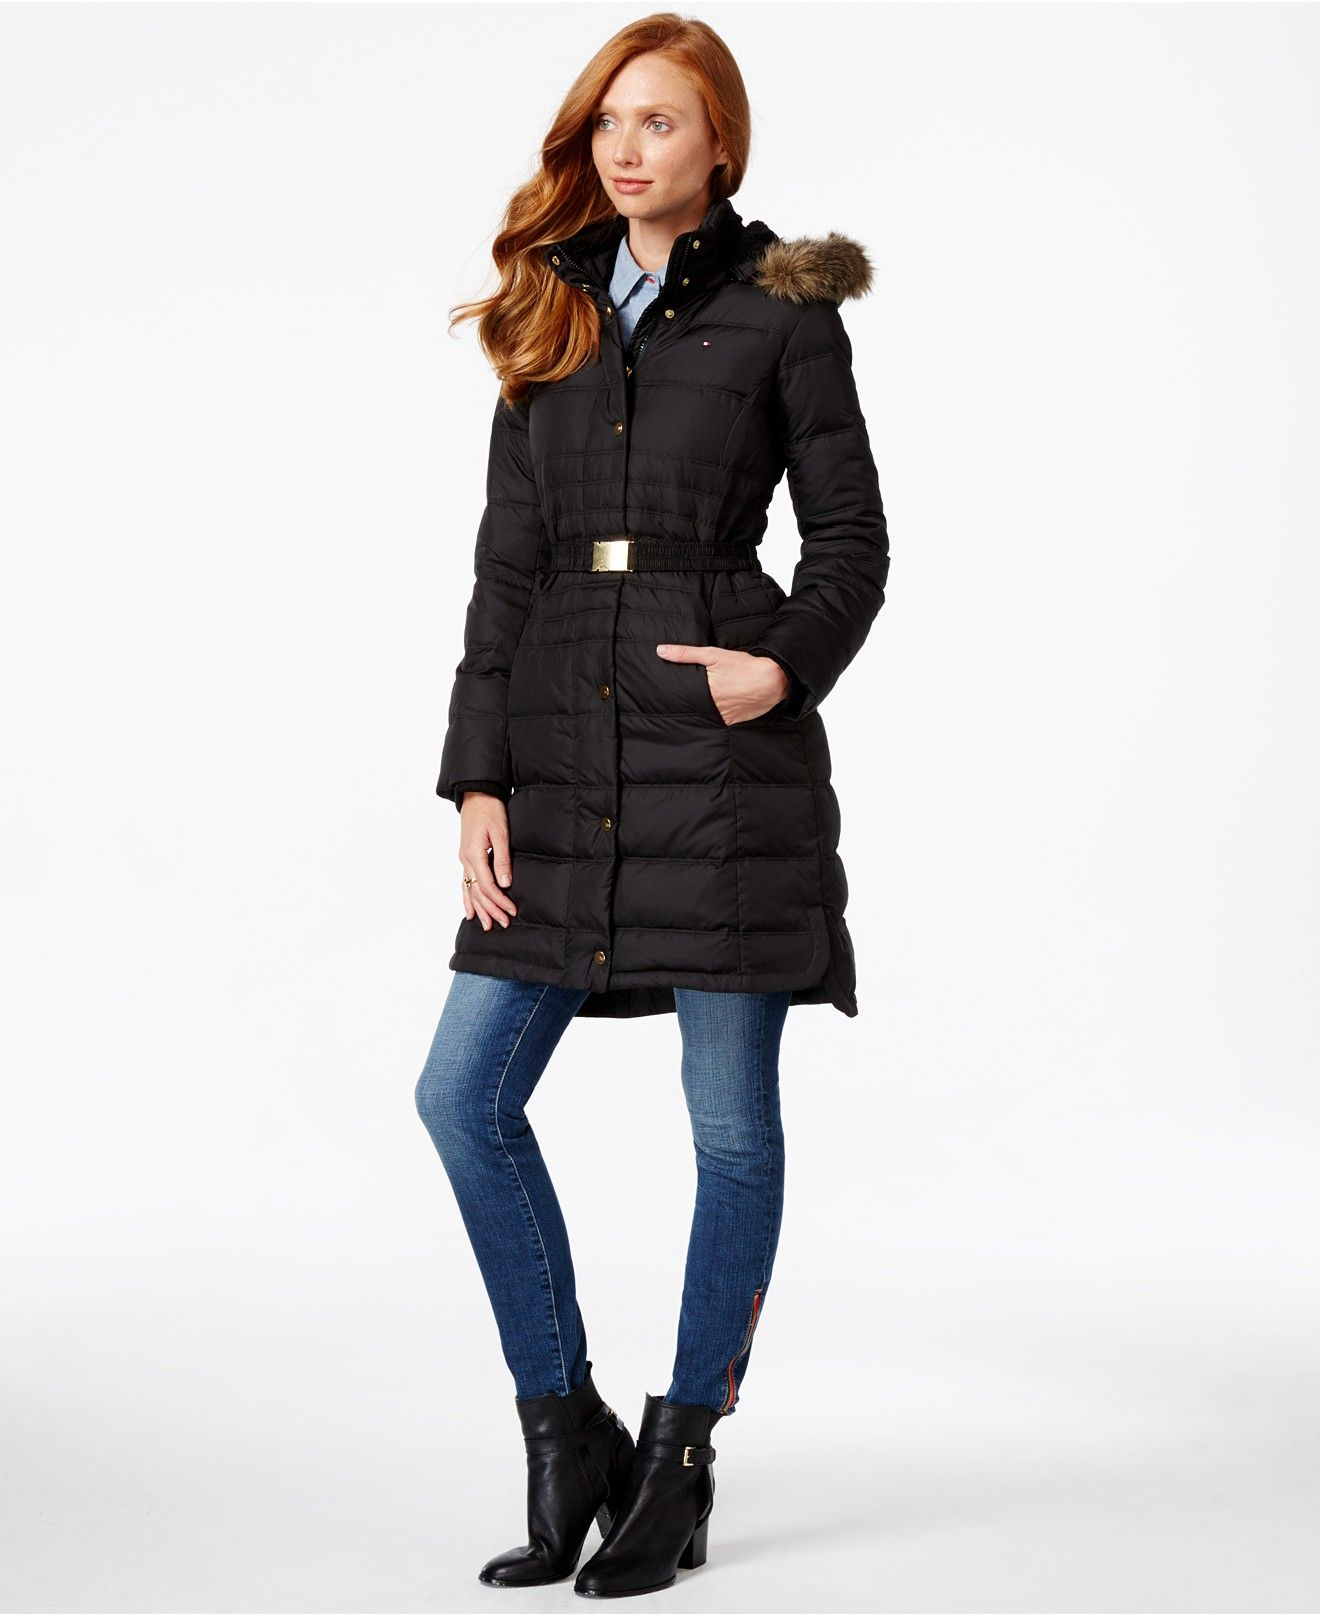 Tommy Hilfiger Faux Fur Trim Belted Puffer Coat Coats Women Macy S Coat Coats For Women Women S Puffer Coats [ 1616 x 1320 Pixel ]